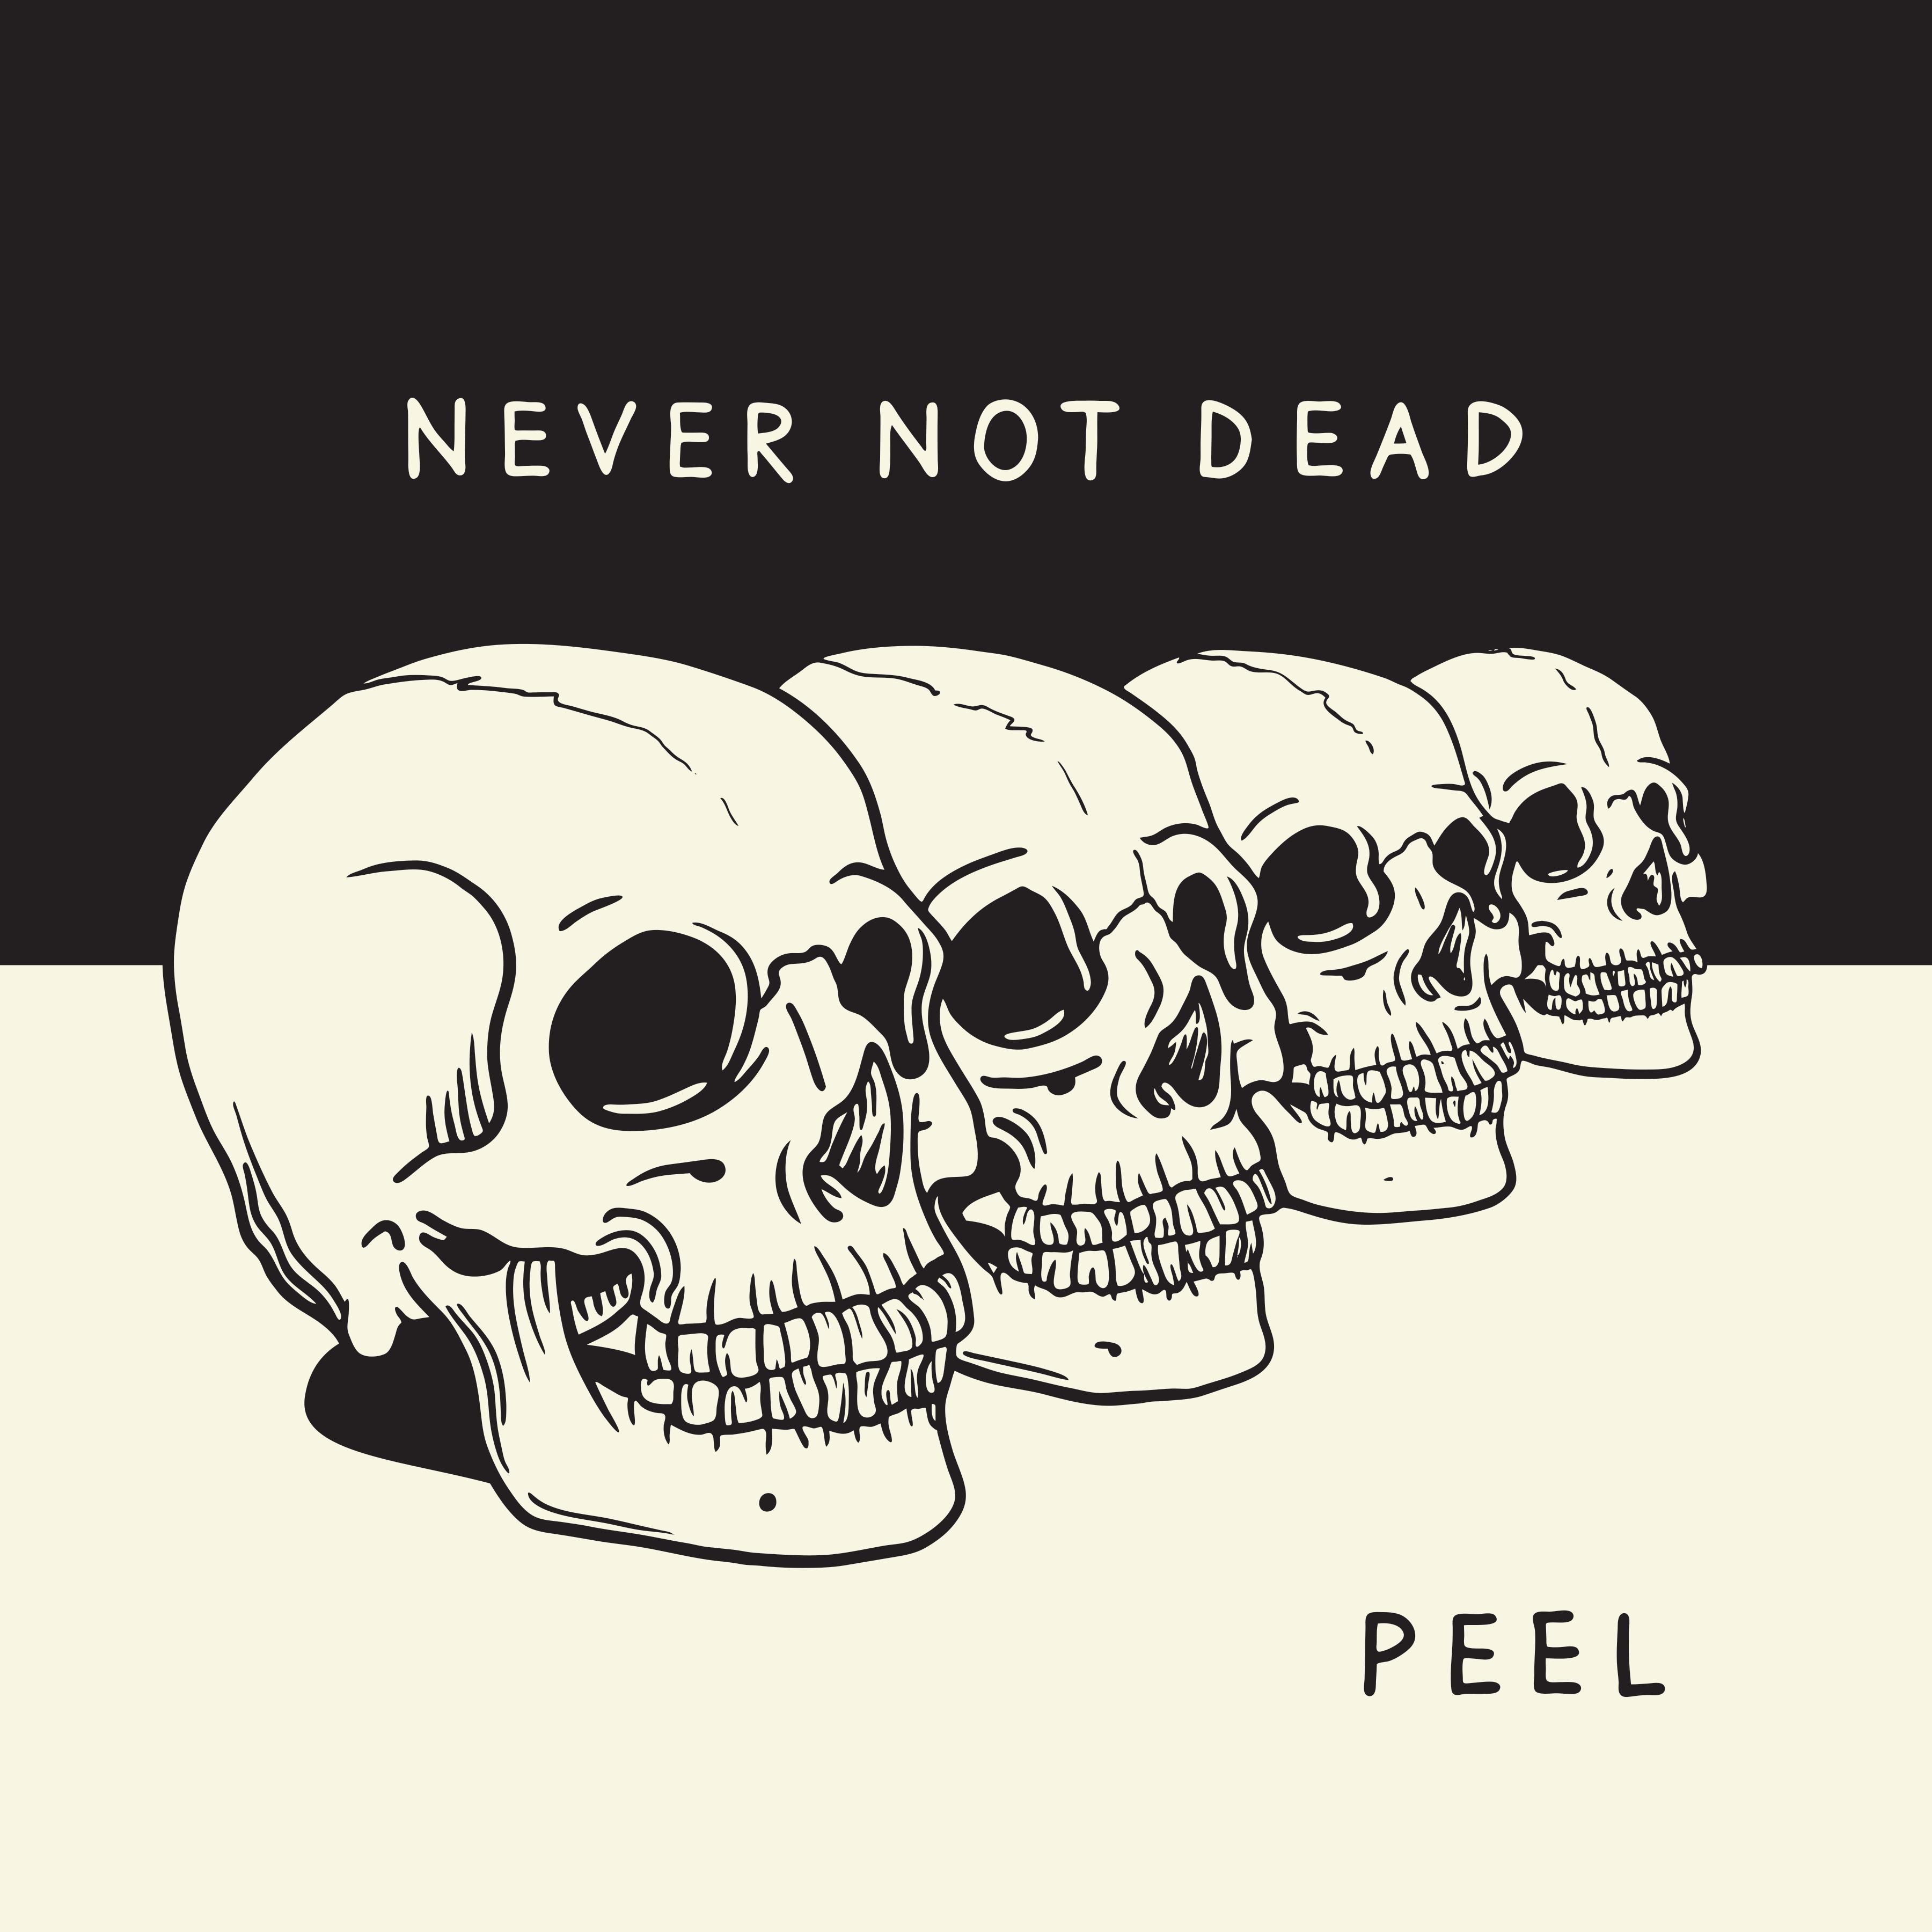 PEEL -- Never Not Dead